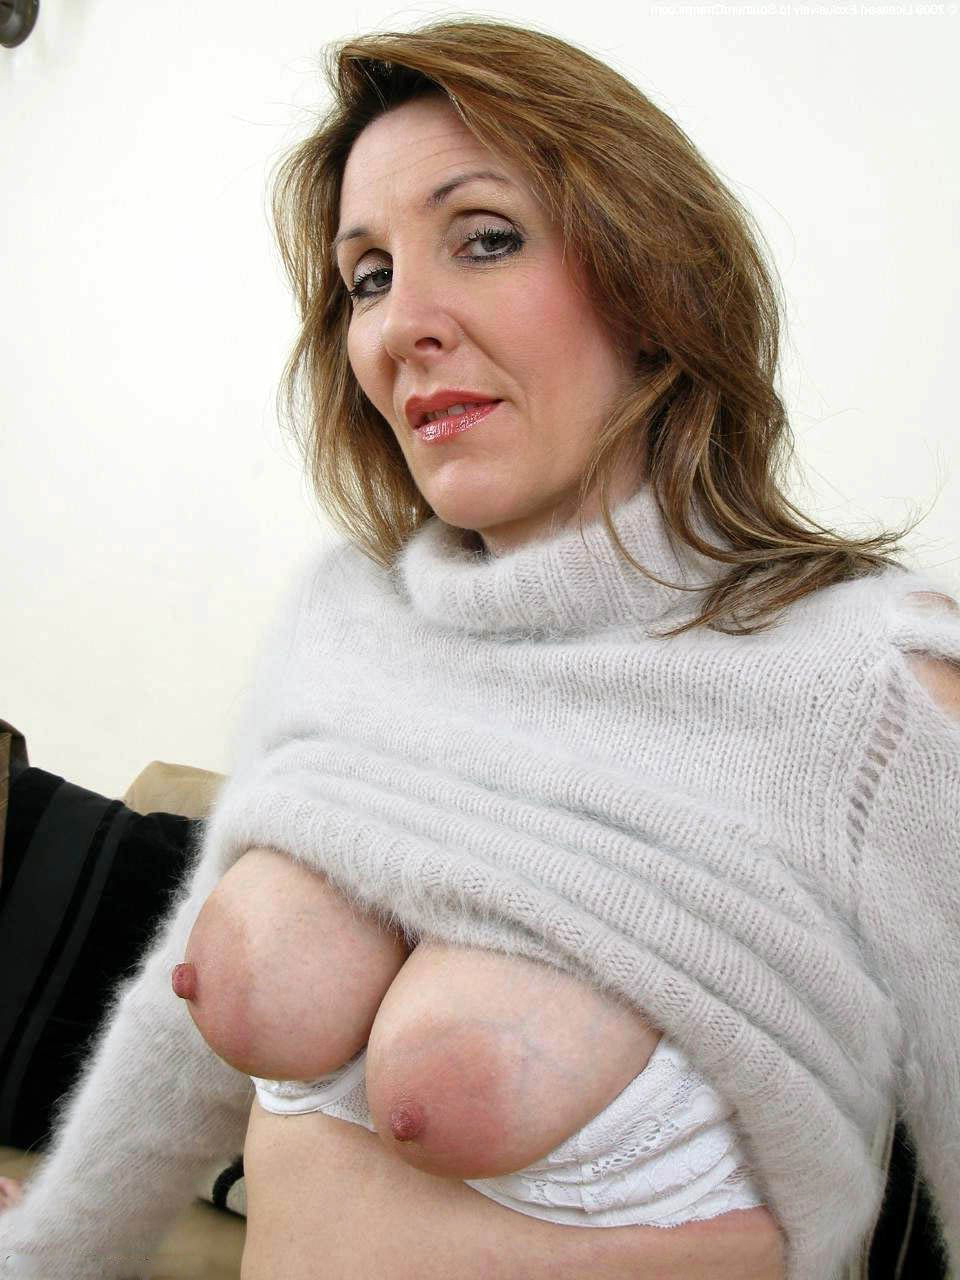 Over 40 mature sex